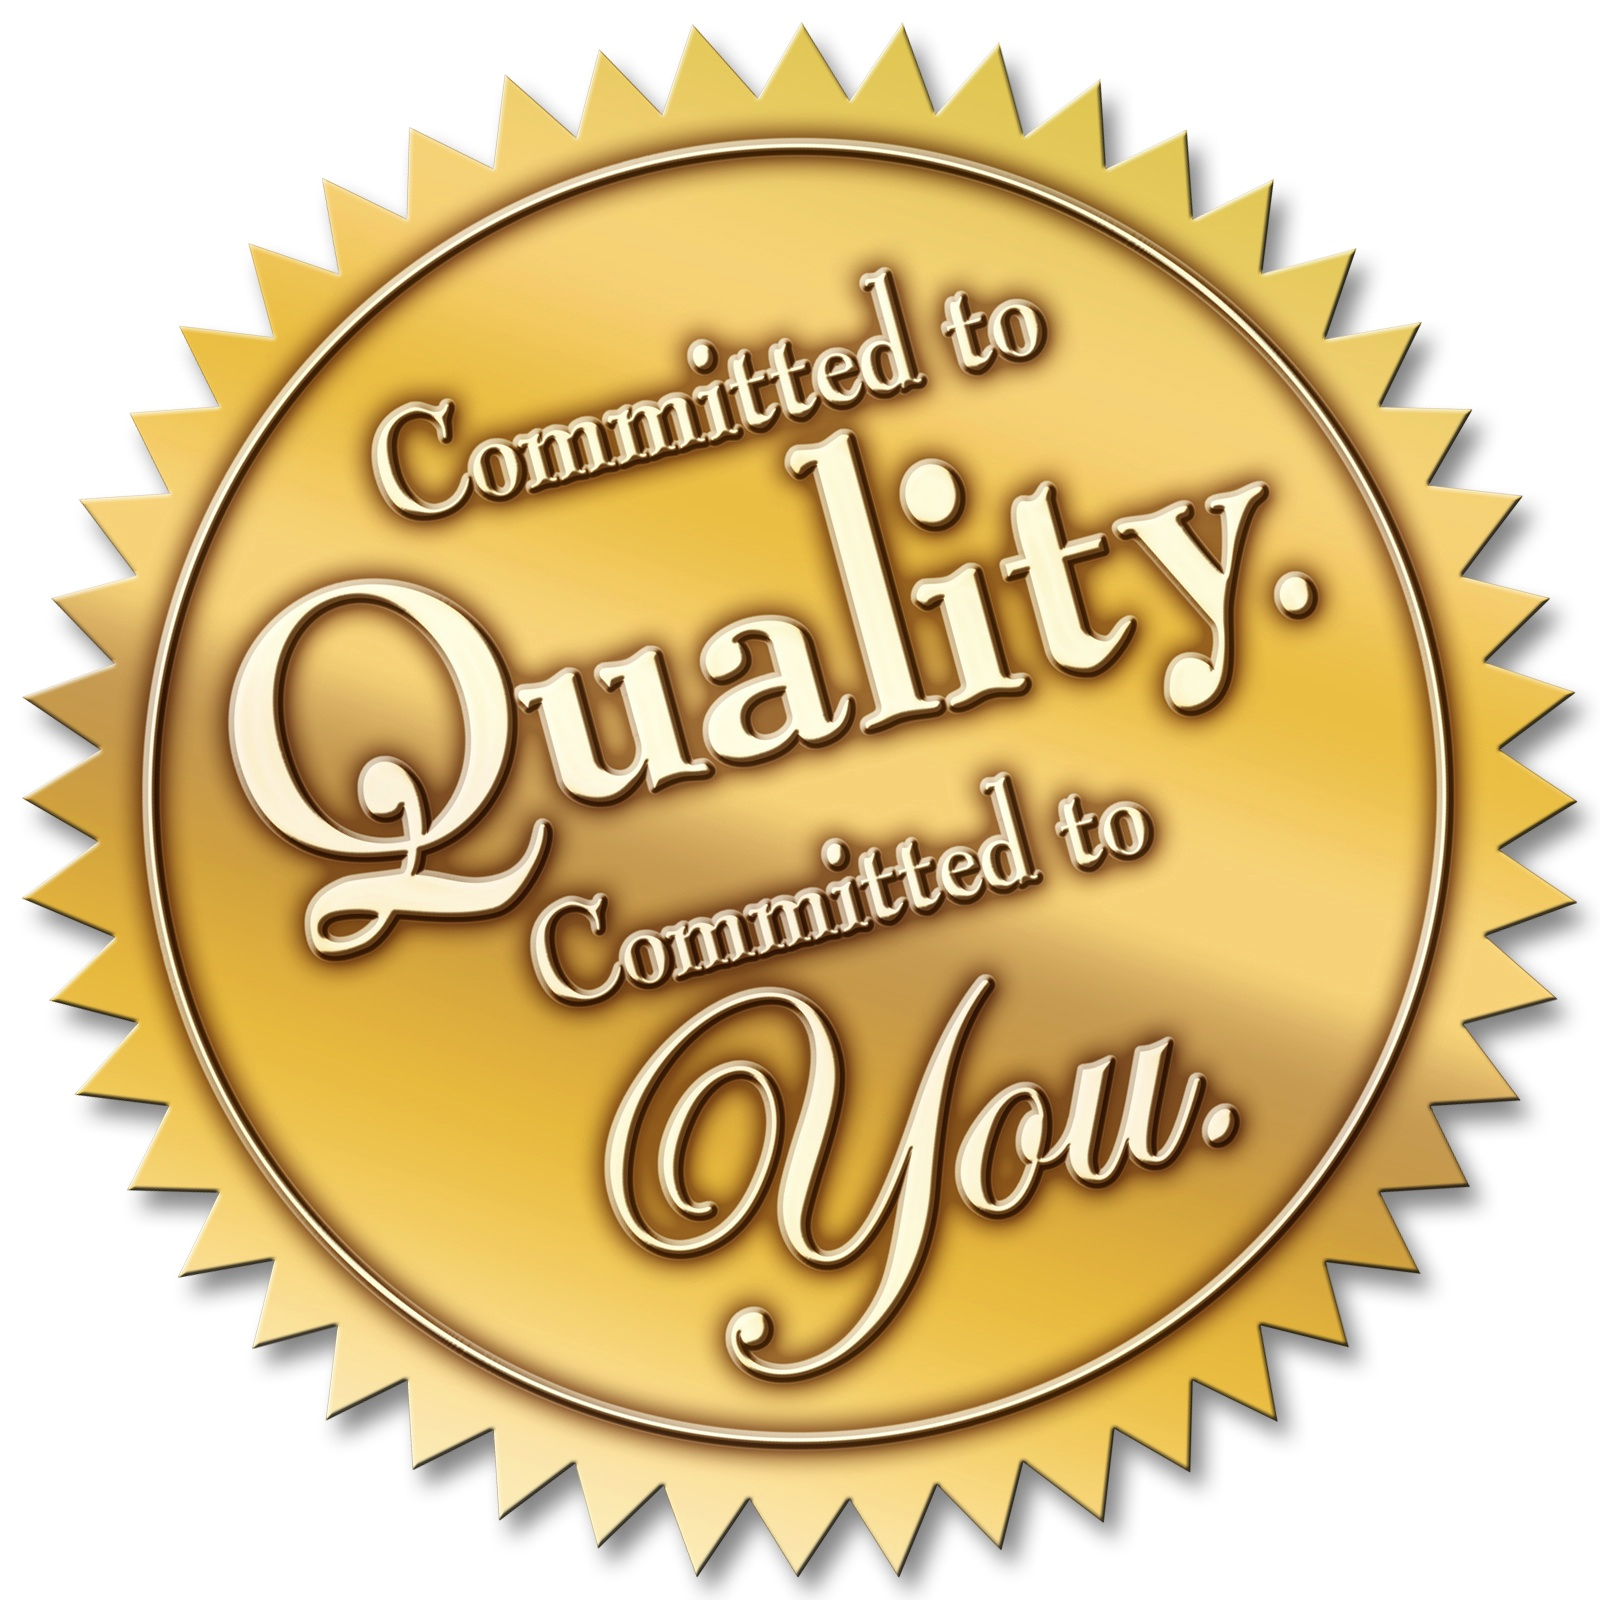 unique ways meet quality people